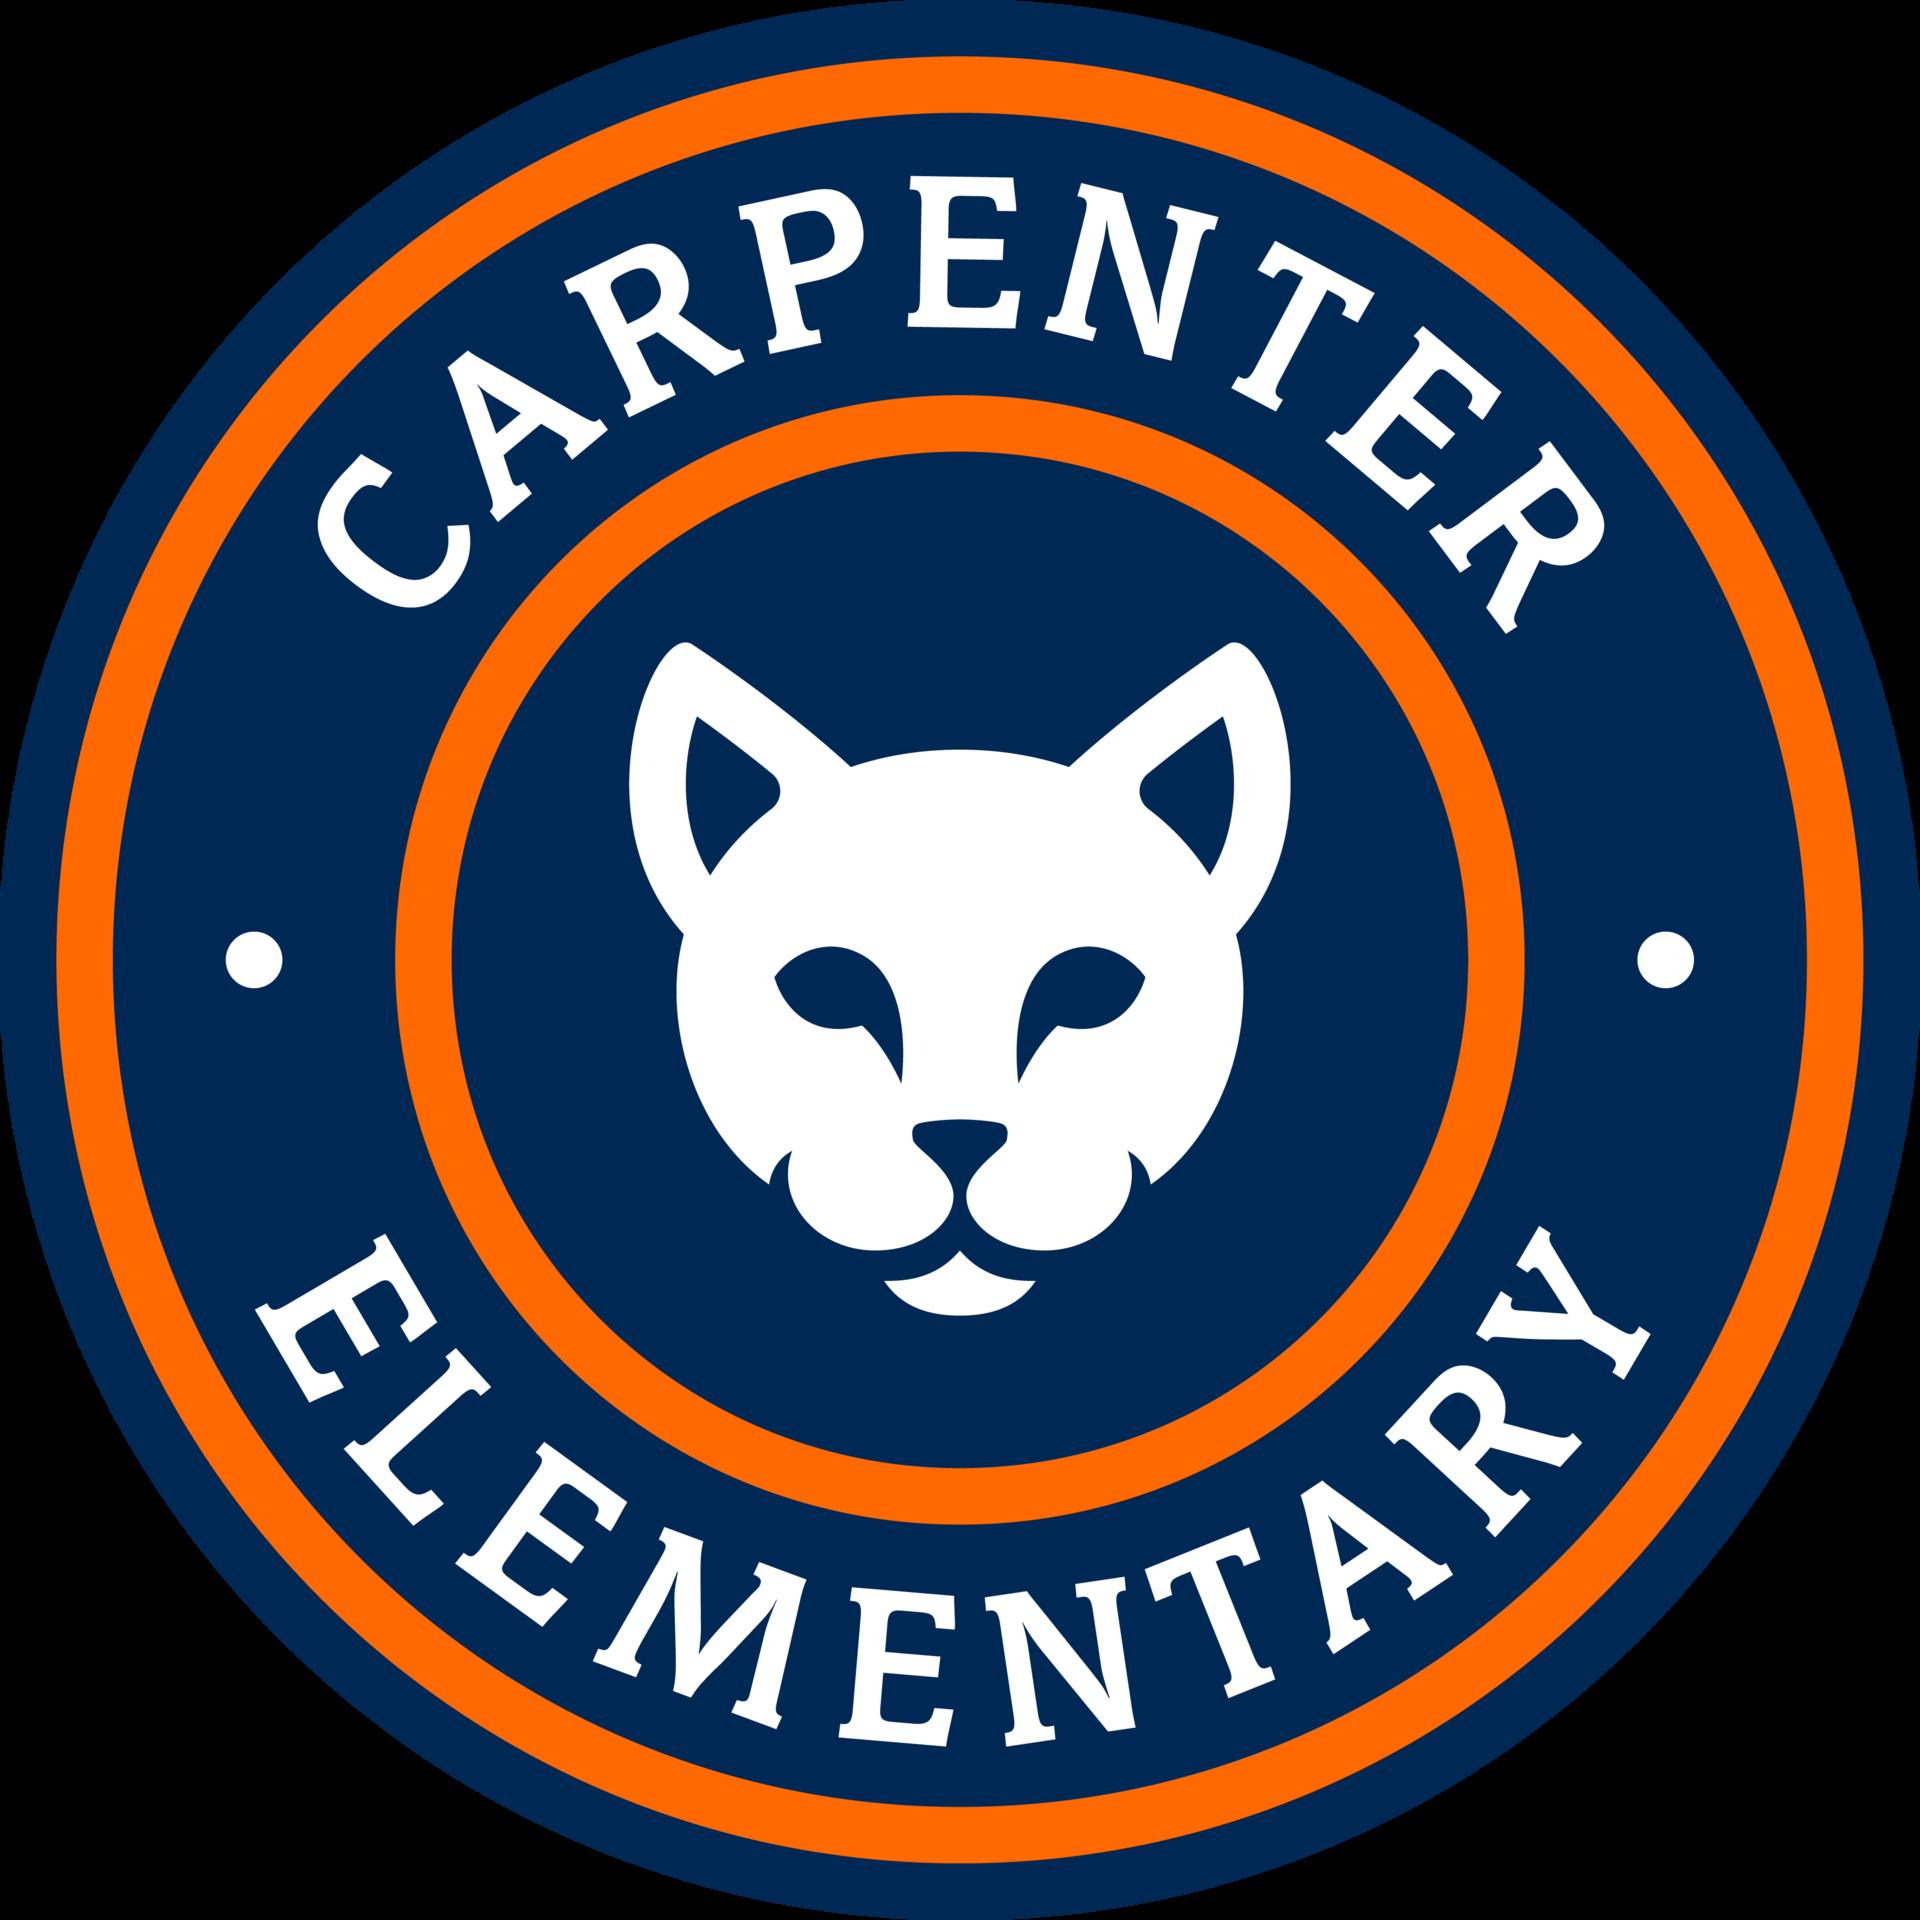 Carpenter Elementary school seal